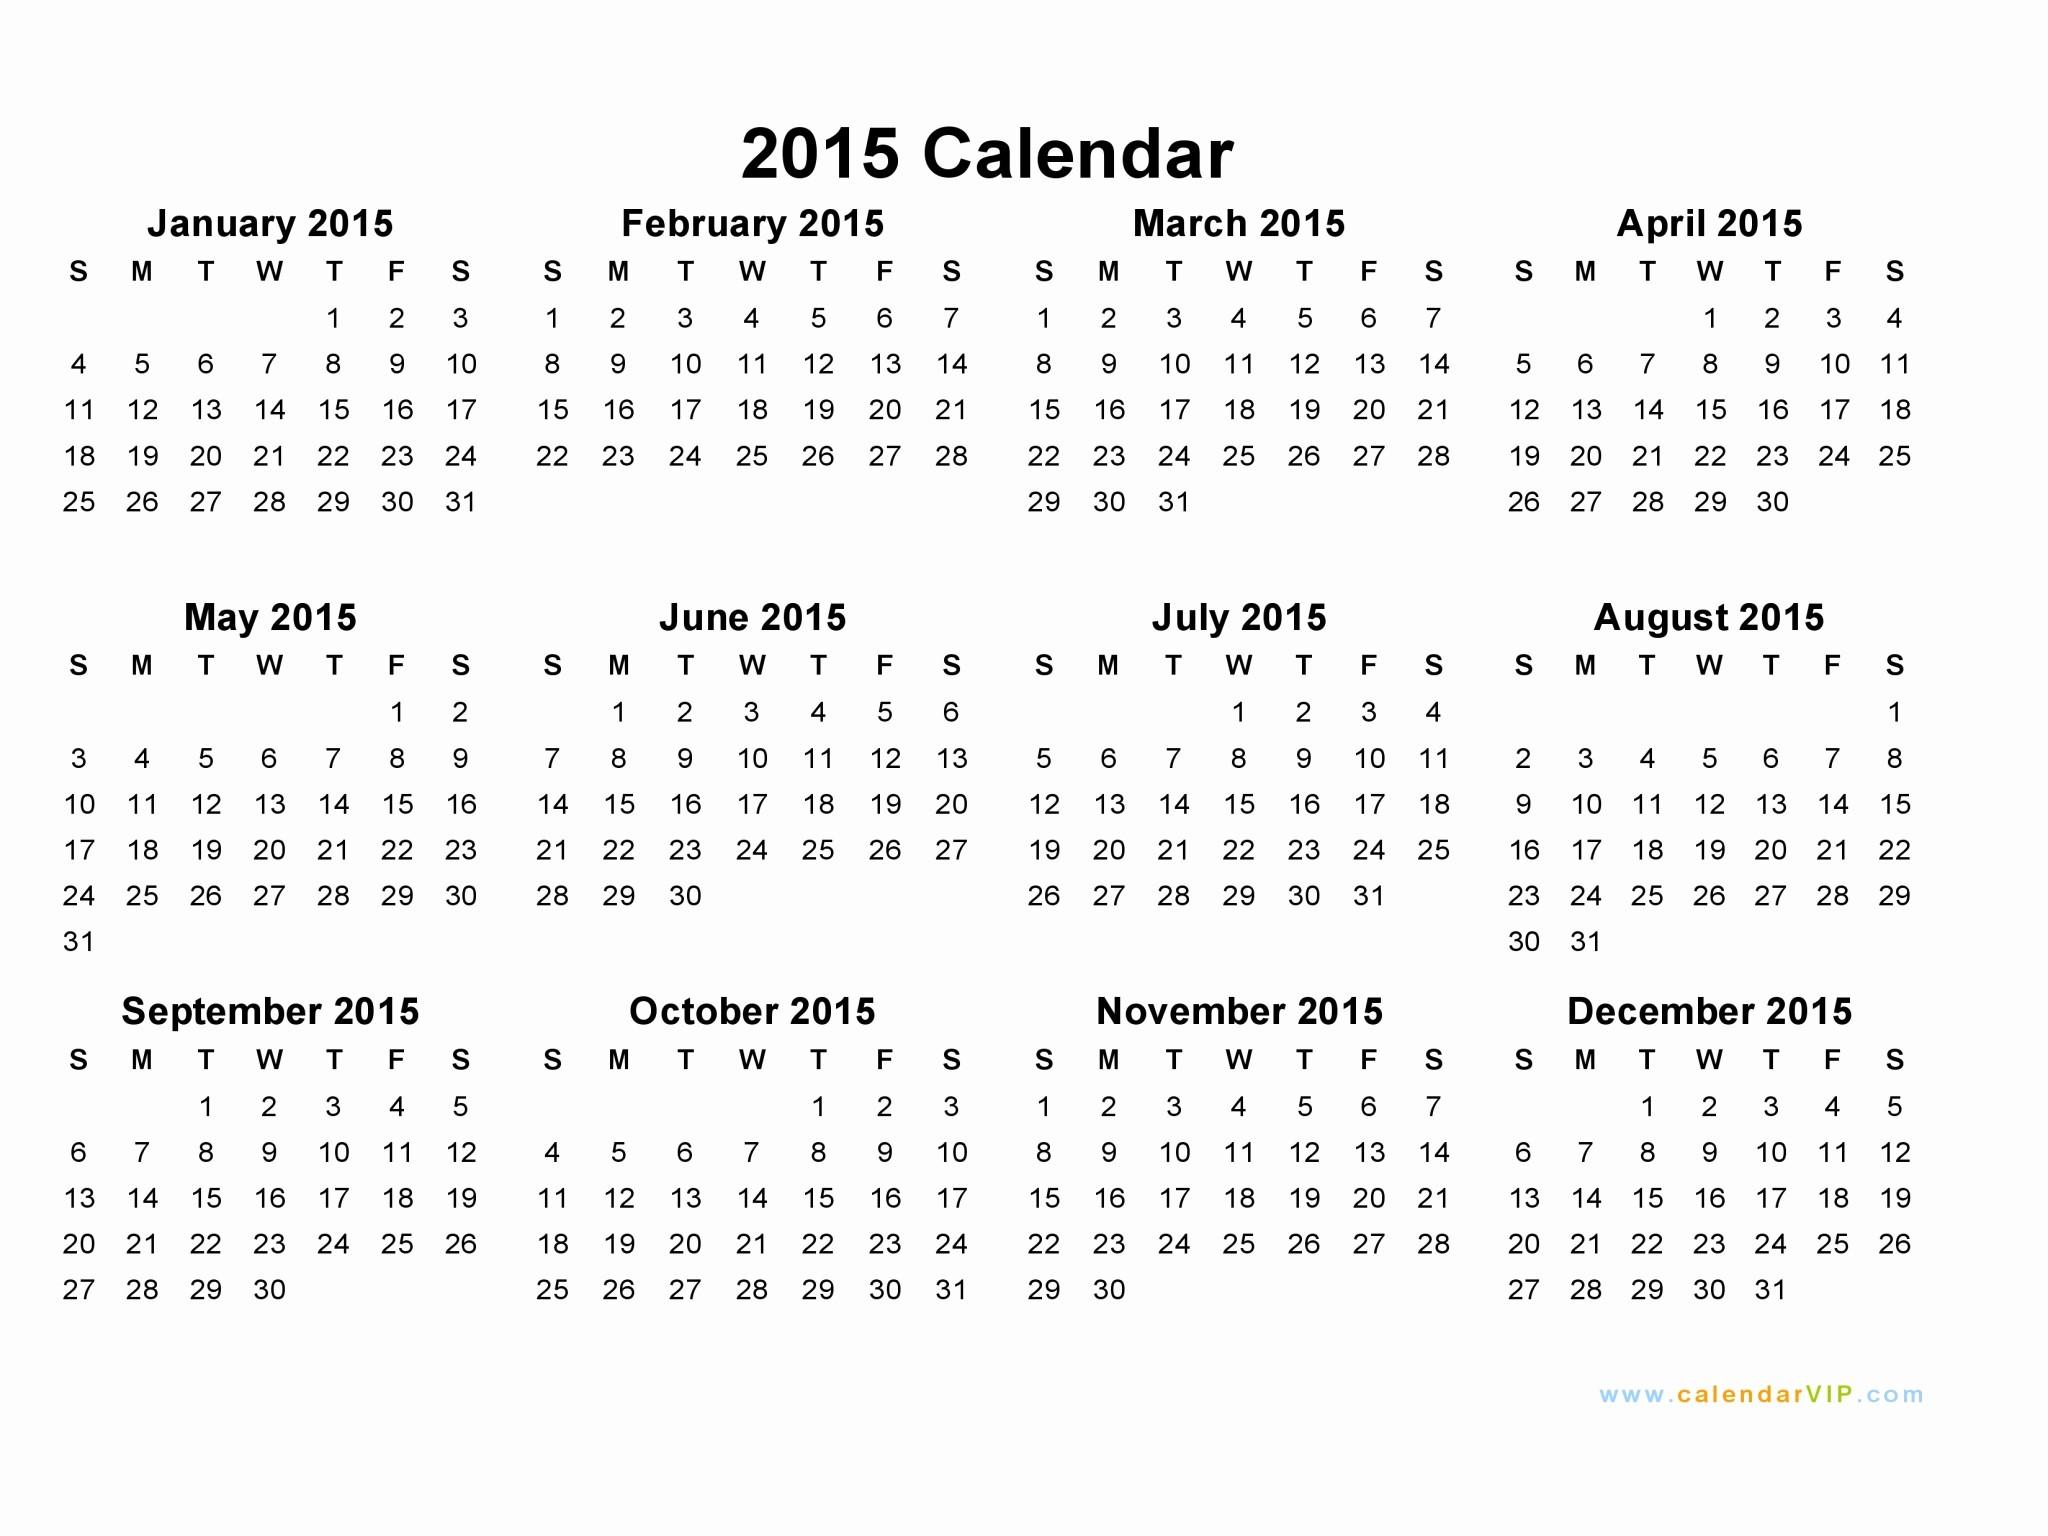 December 2015 Calendar Word Document Fresh 2015 Calendar Blank Printable Calendar Template In Pdf